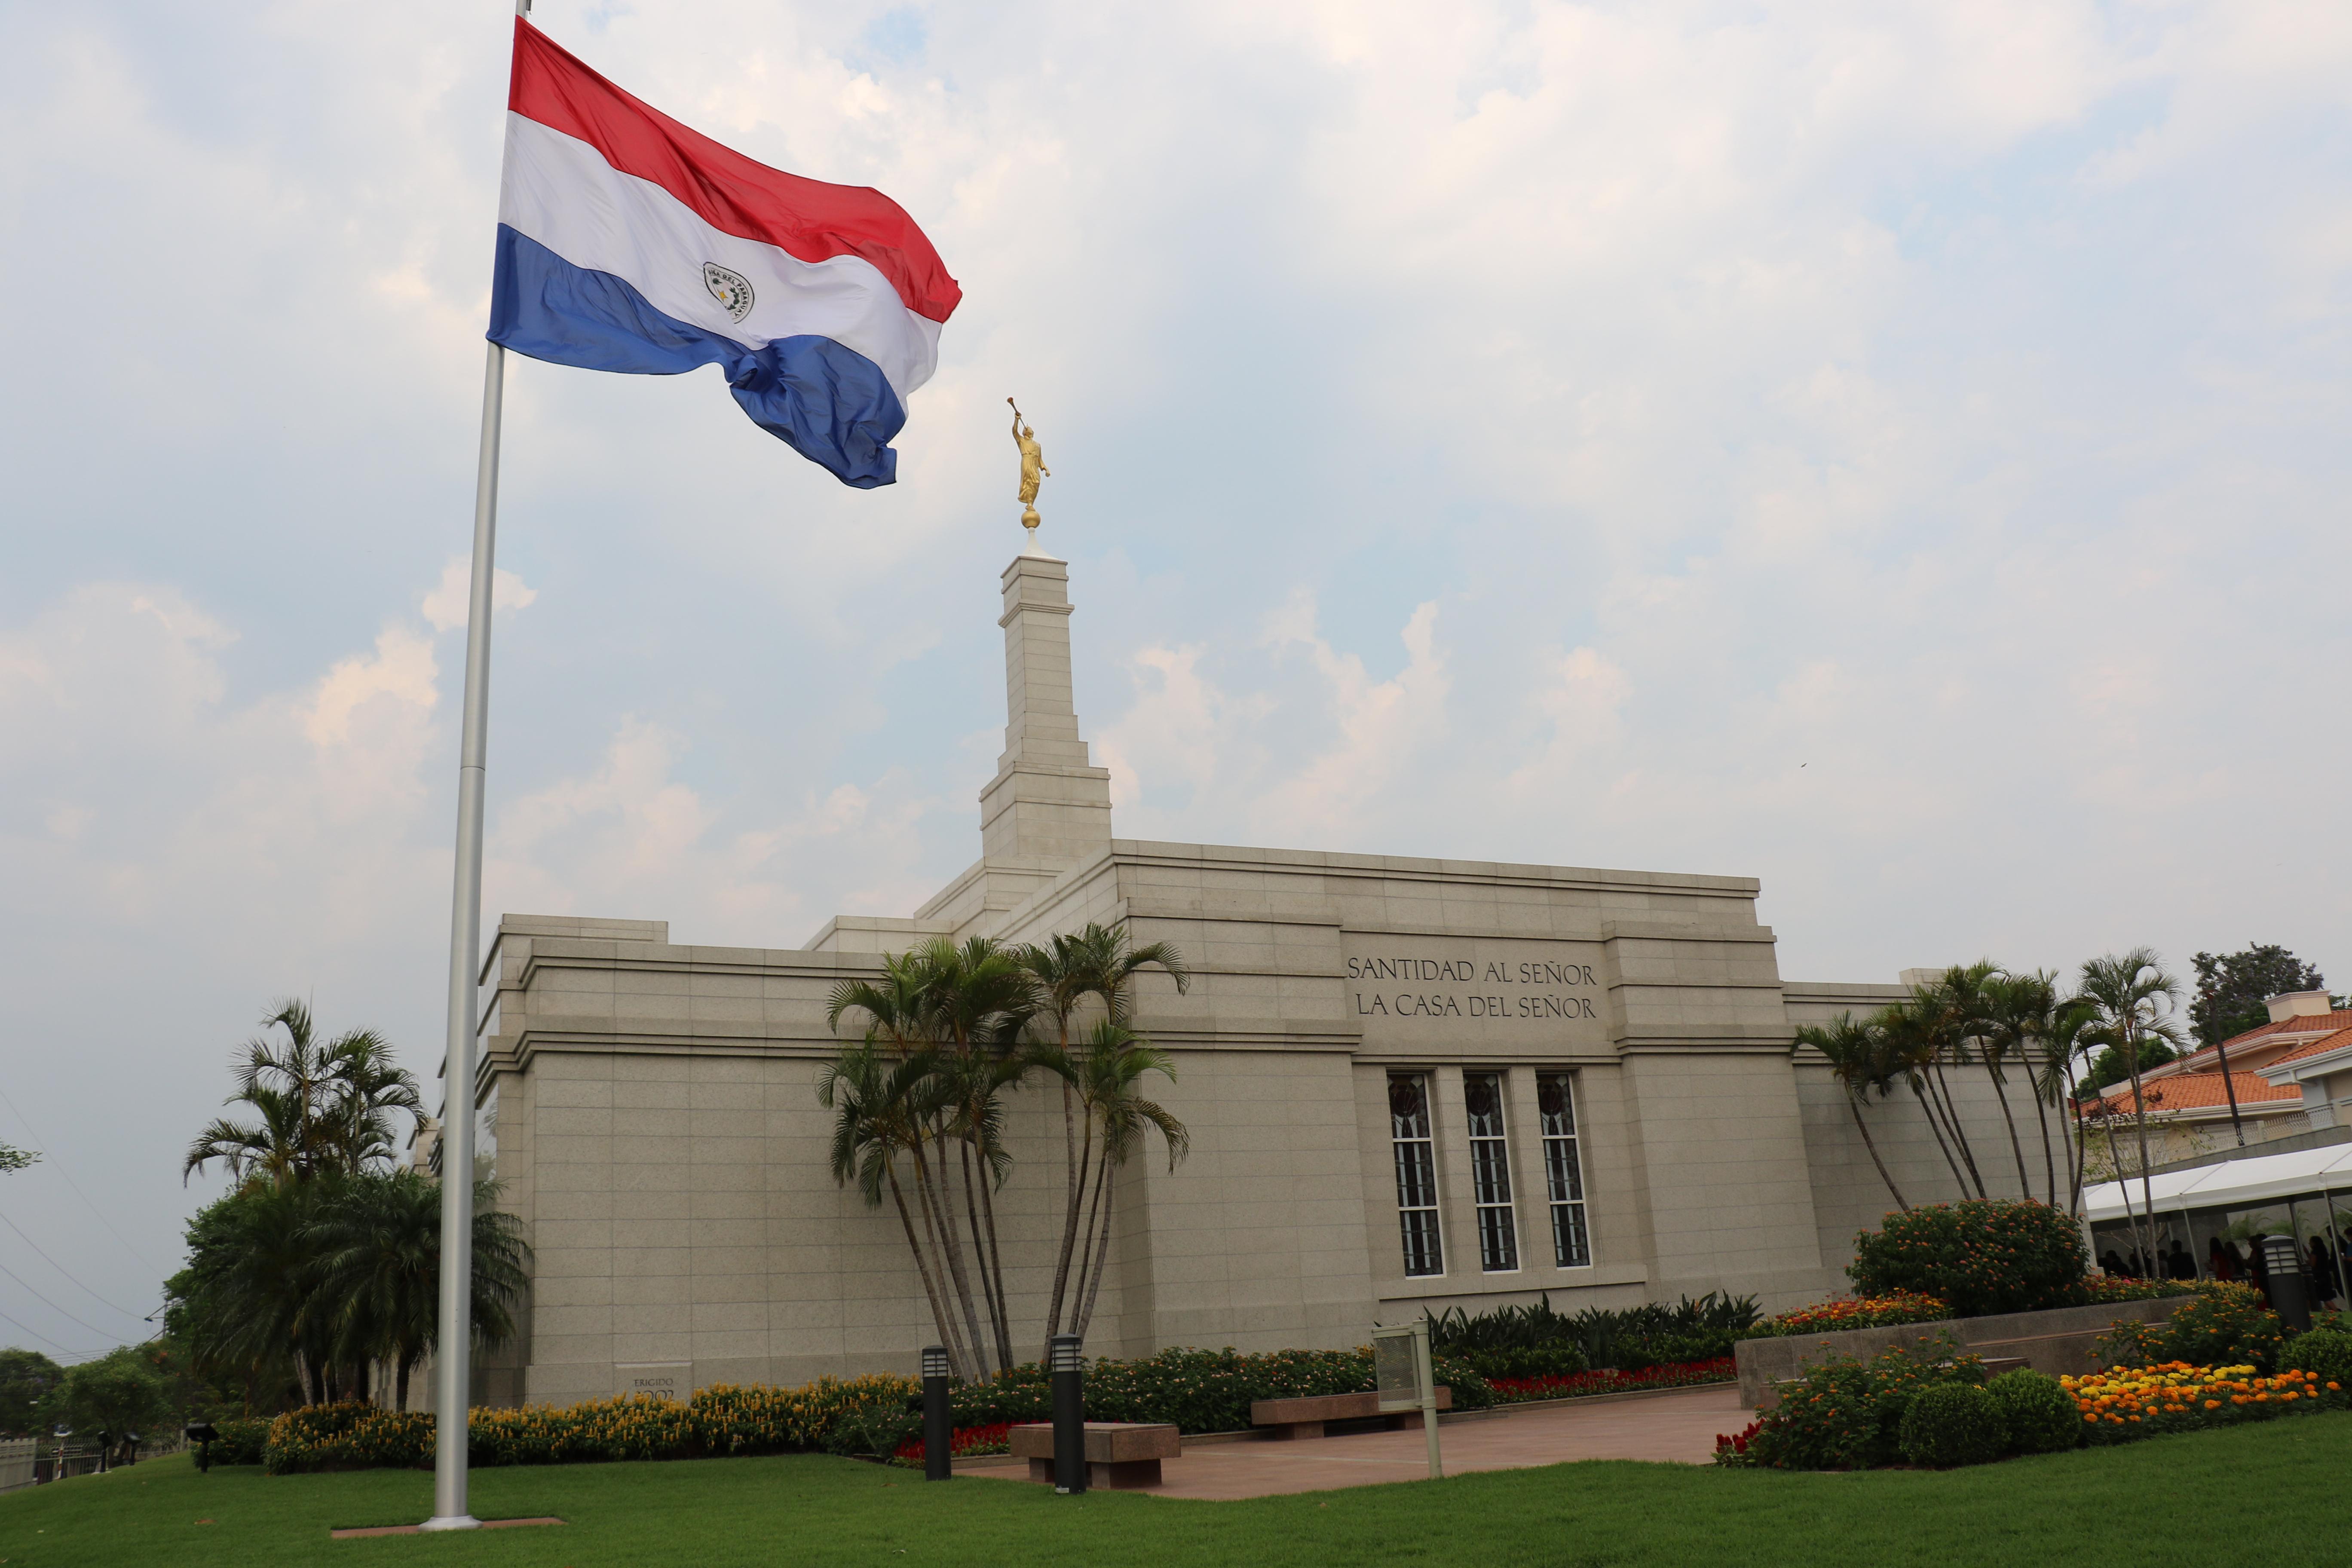 Originally dedicated in 2002 by President Gordon B. Hinckley, the Asuncion Paraguay Temple was rededicated on Nov. 3, 2019, by Elder D. Todd Christofferson.